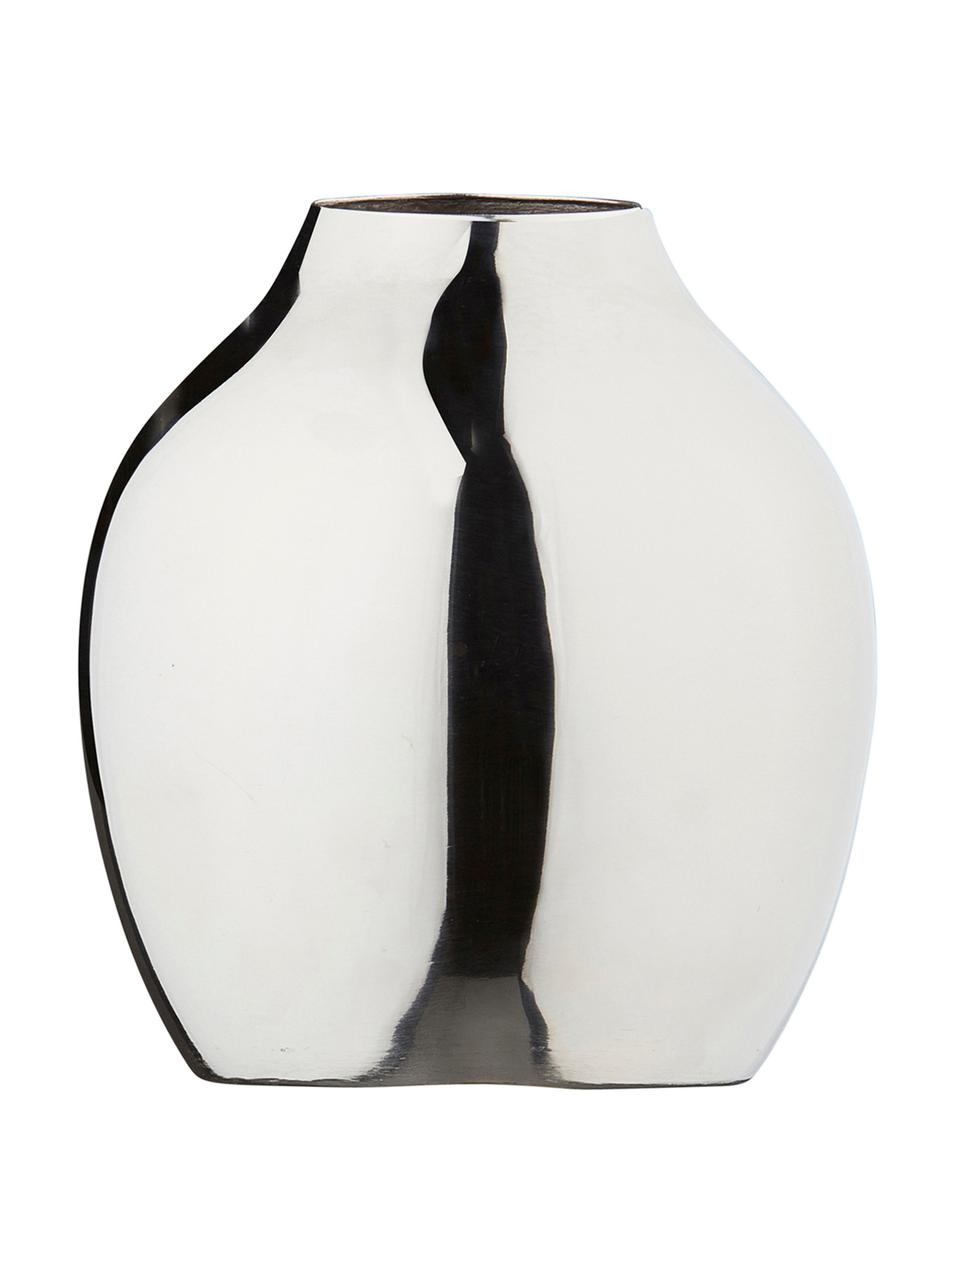 Vaso in metallo Gunnebo, Metallo verniciato, Metallo, Ø 8 x Alt. 10 cm